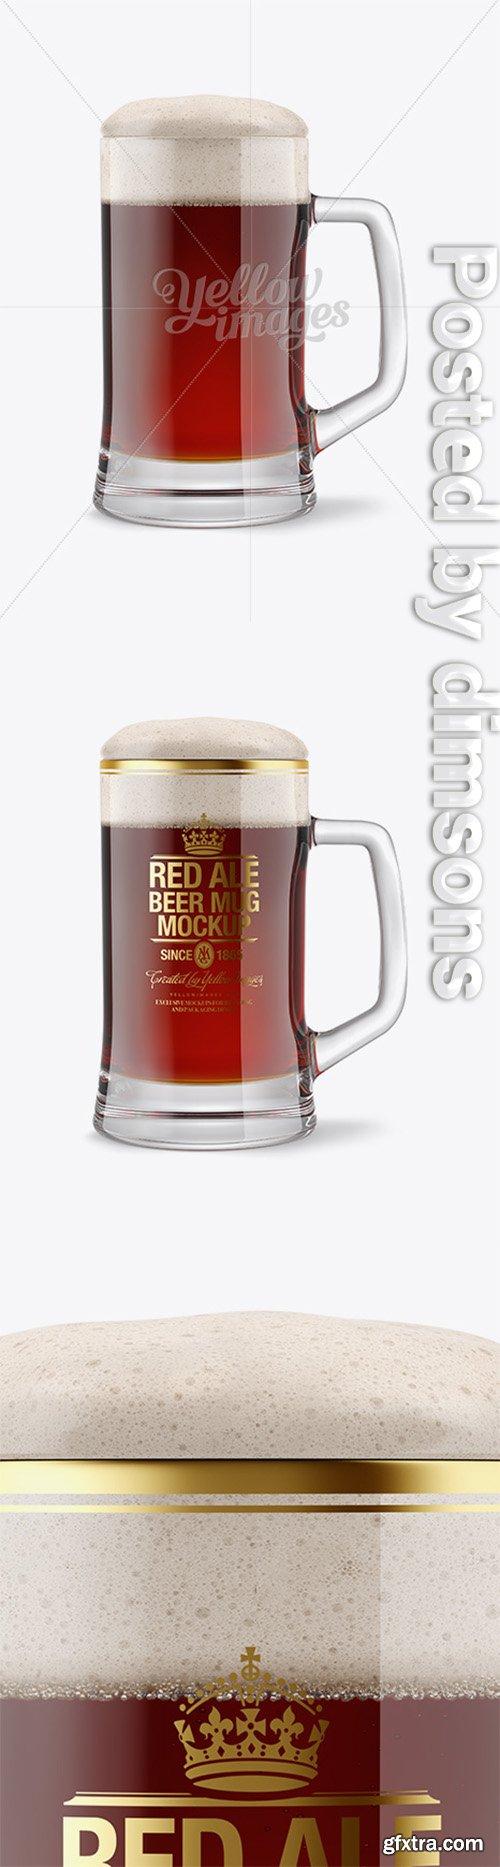 Tankard Glass Mug with Red Ale Beer Mockup 14665